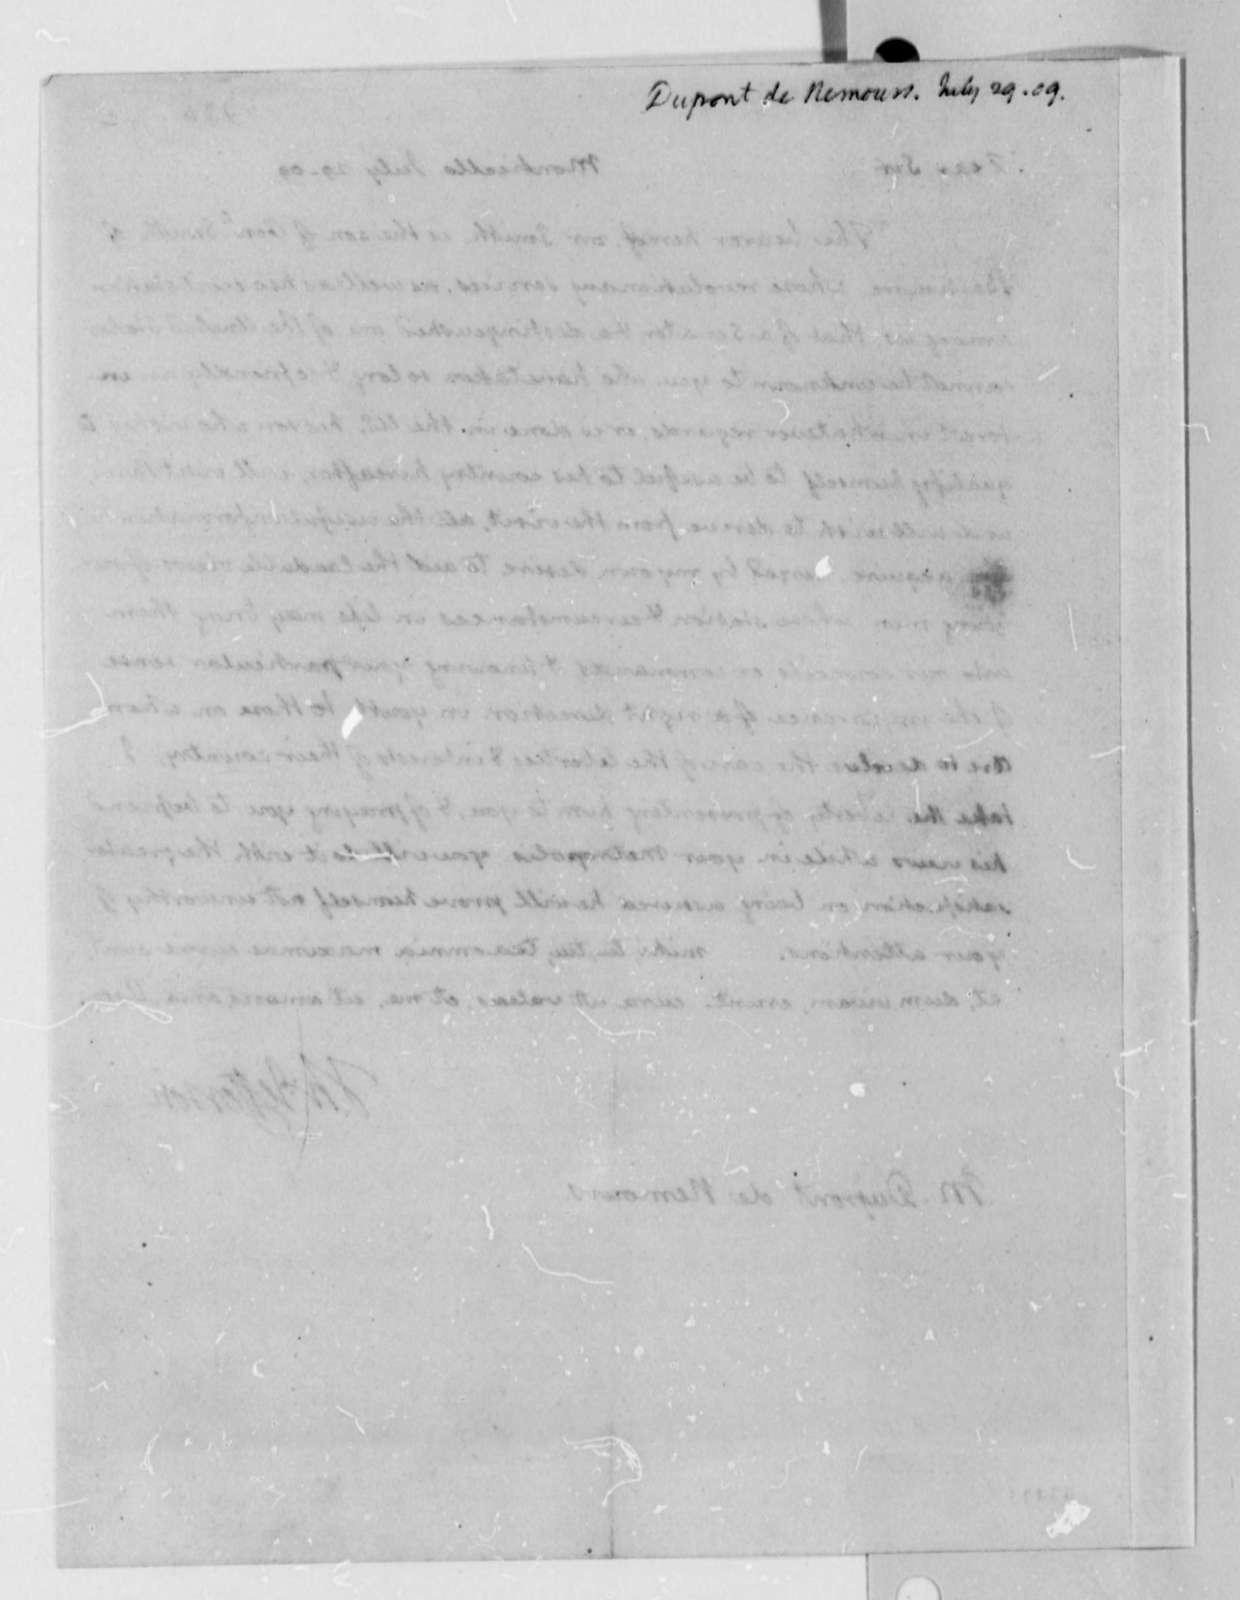 Thomas Jefferson to Pierre S. Dupont de Nemours, July 29, 1809